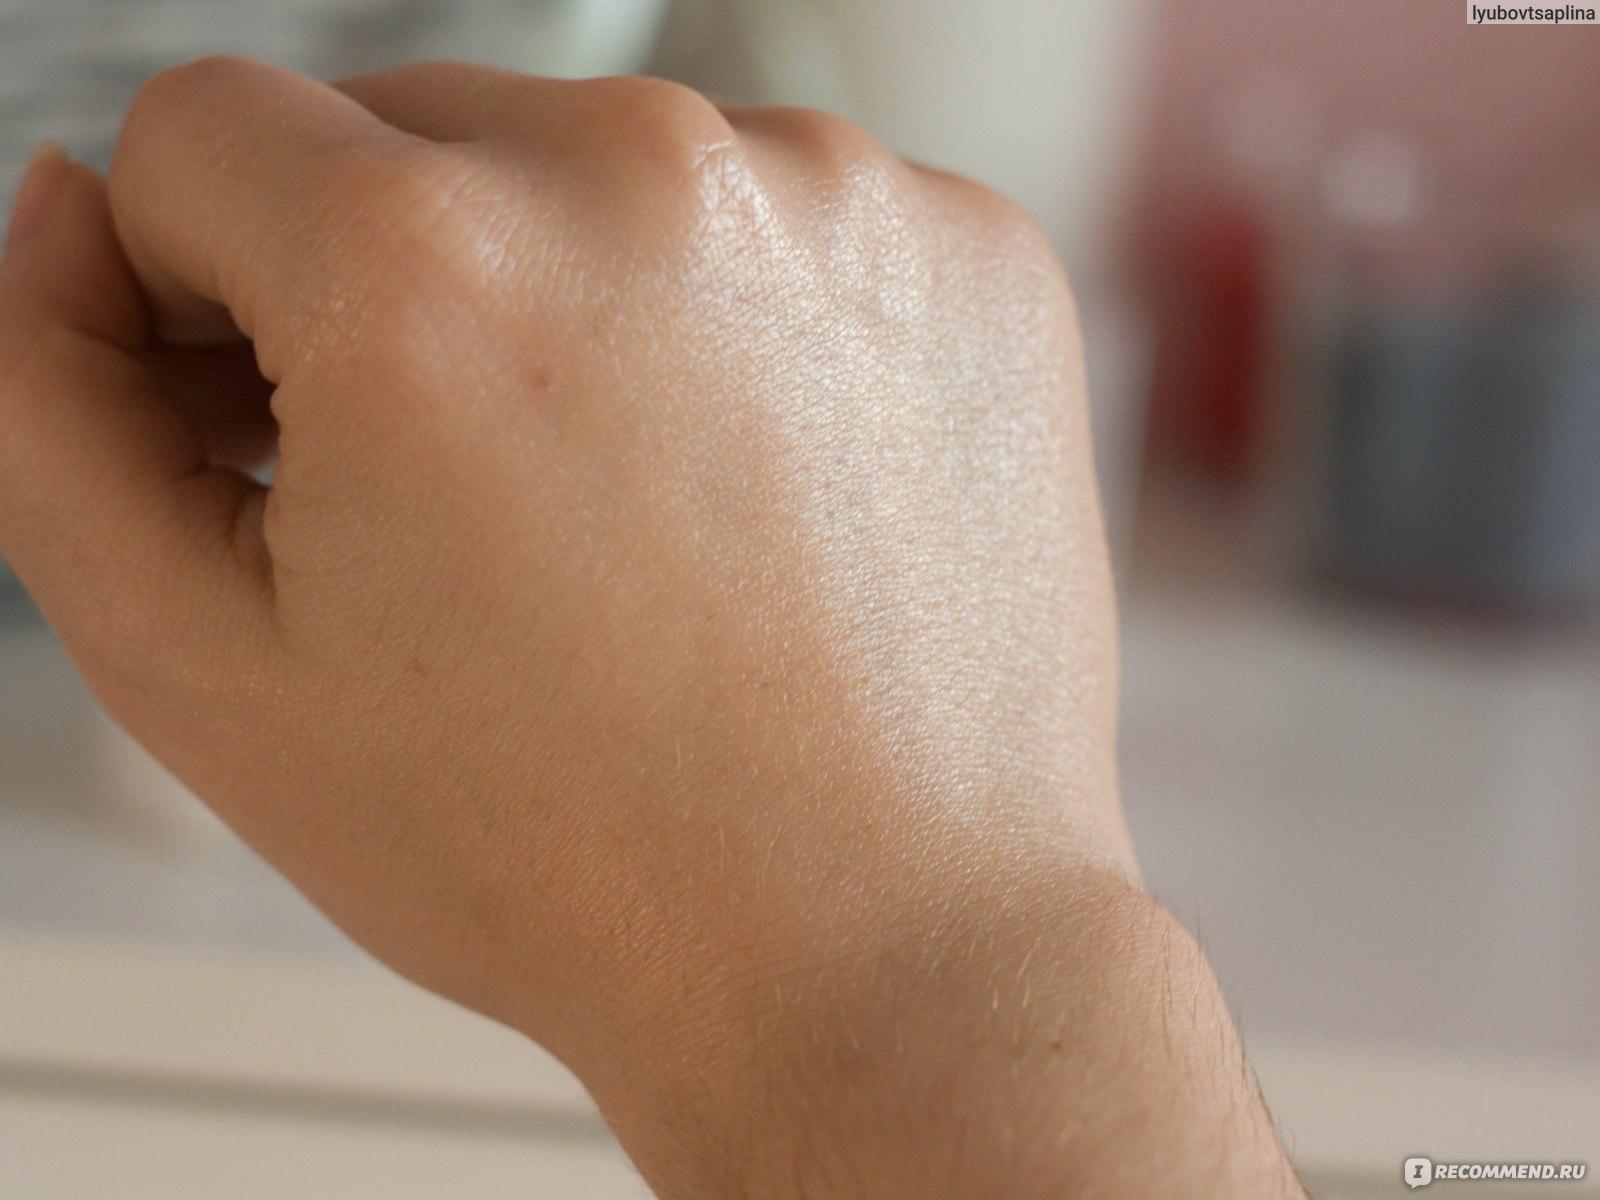 Berrisom 24 Oops My Aurora Cream Collagen Intensive Firming 50gr